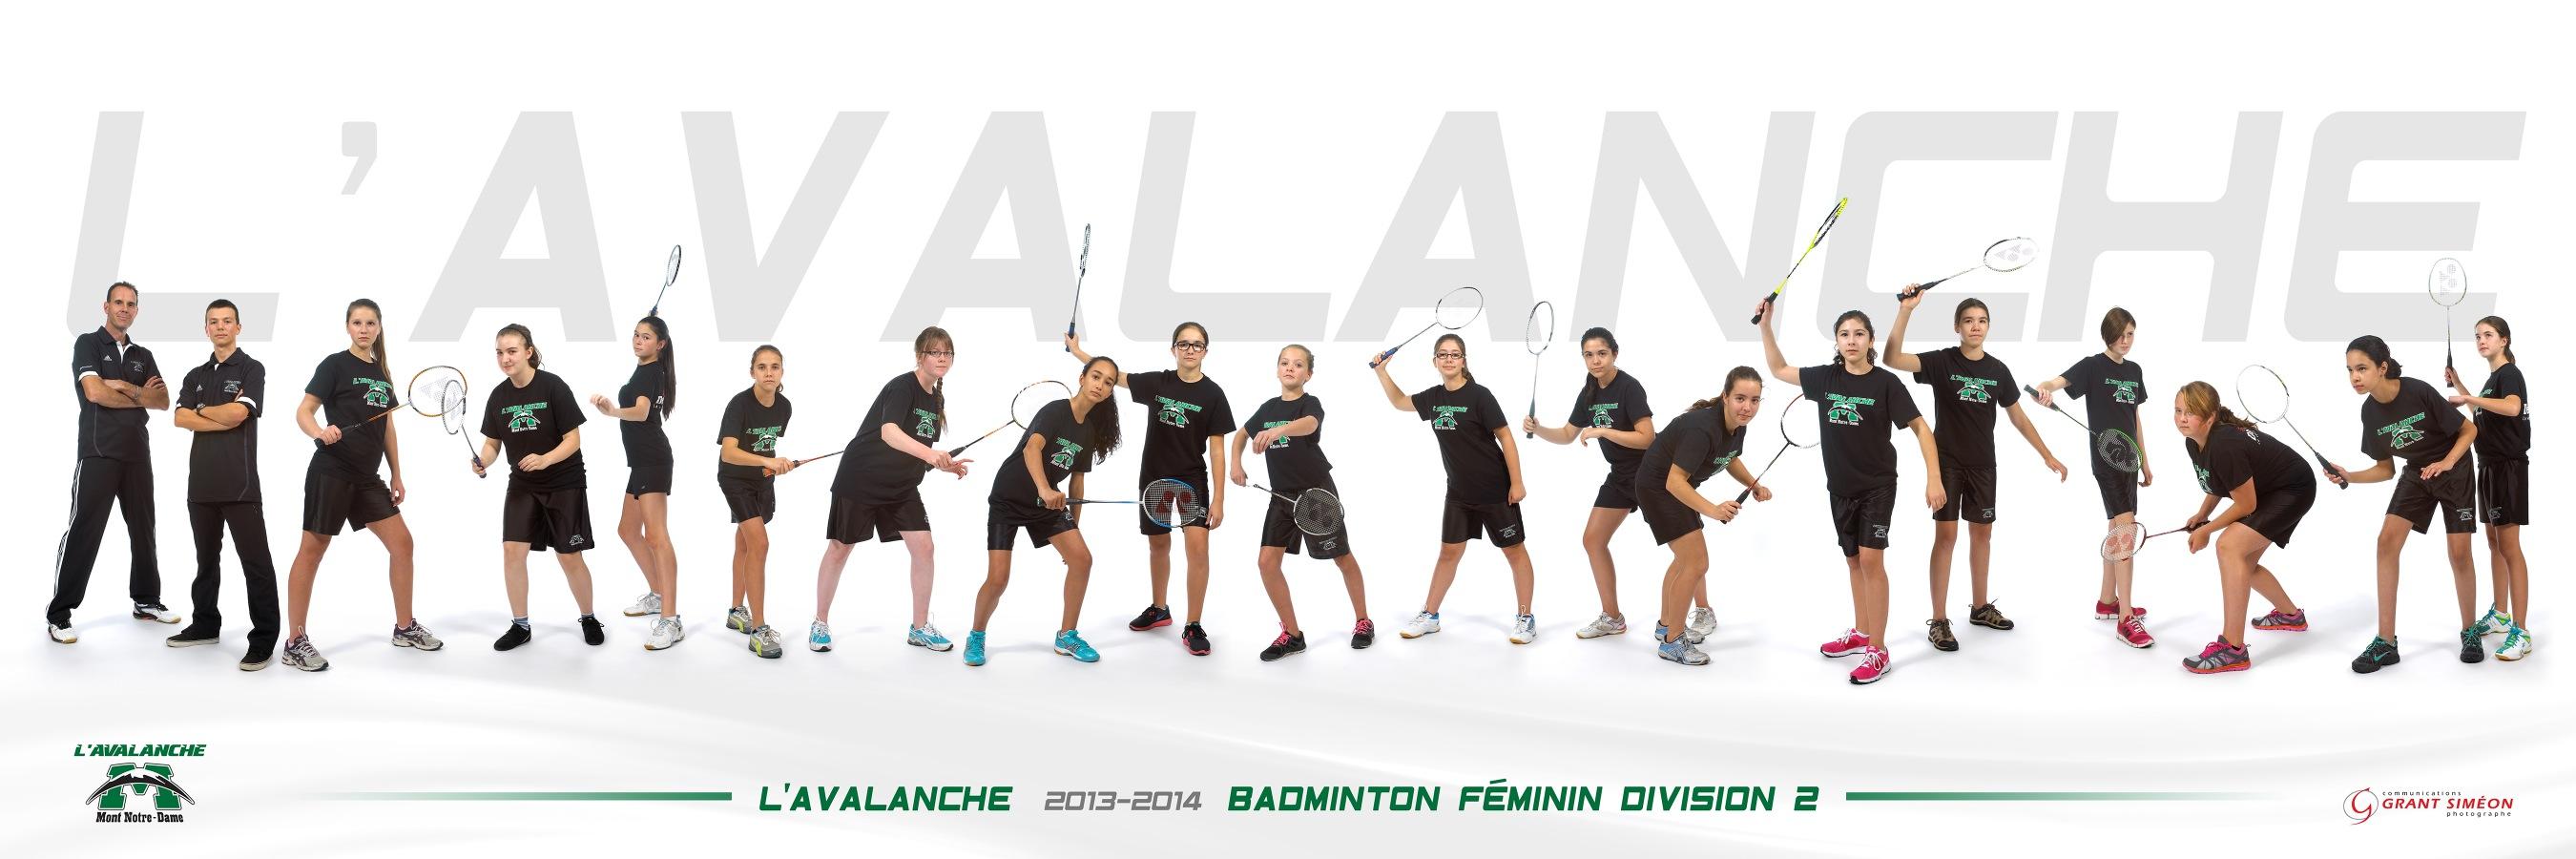 MND_badminton-div-2-2013-2014